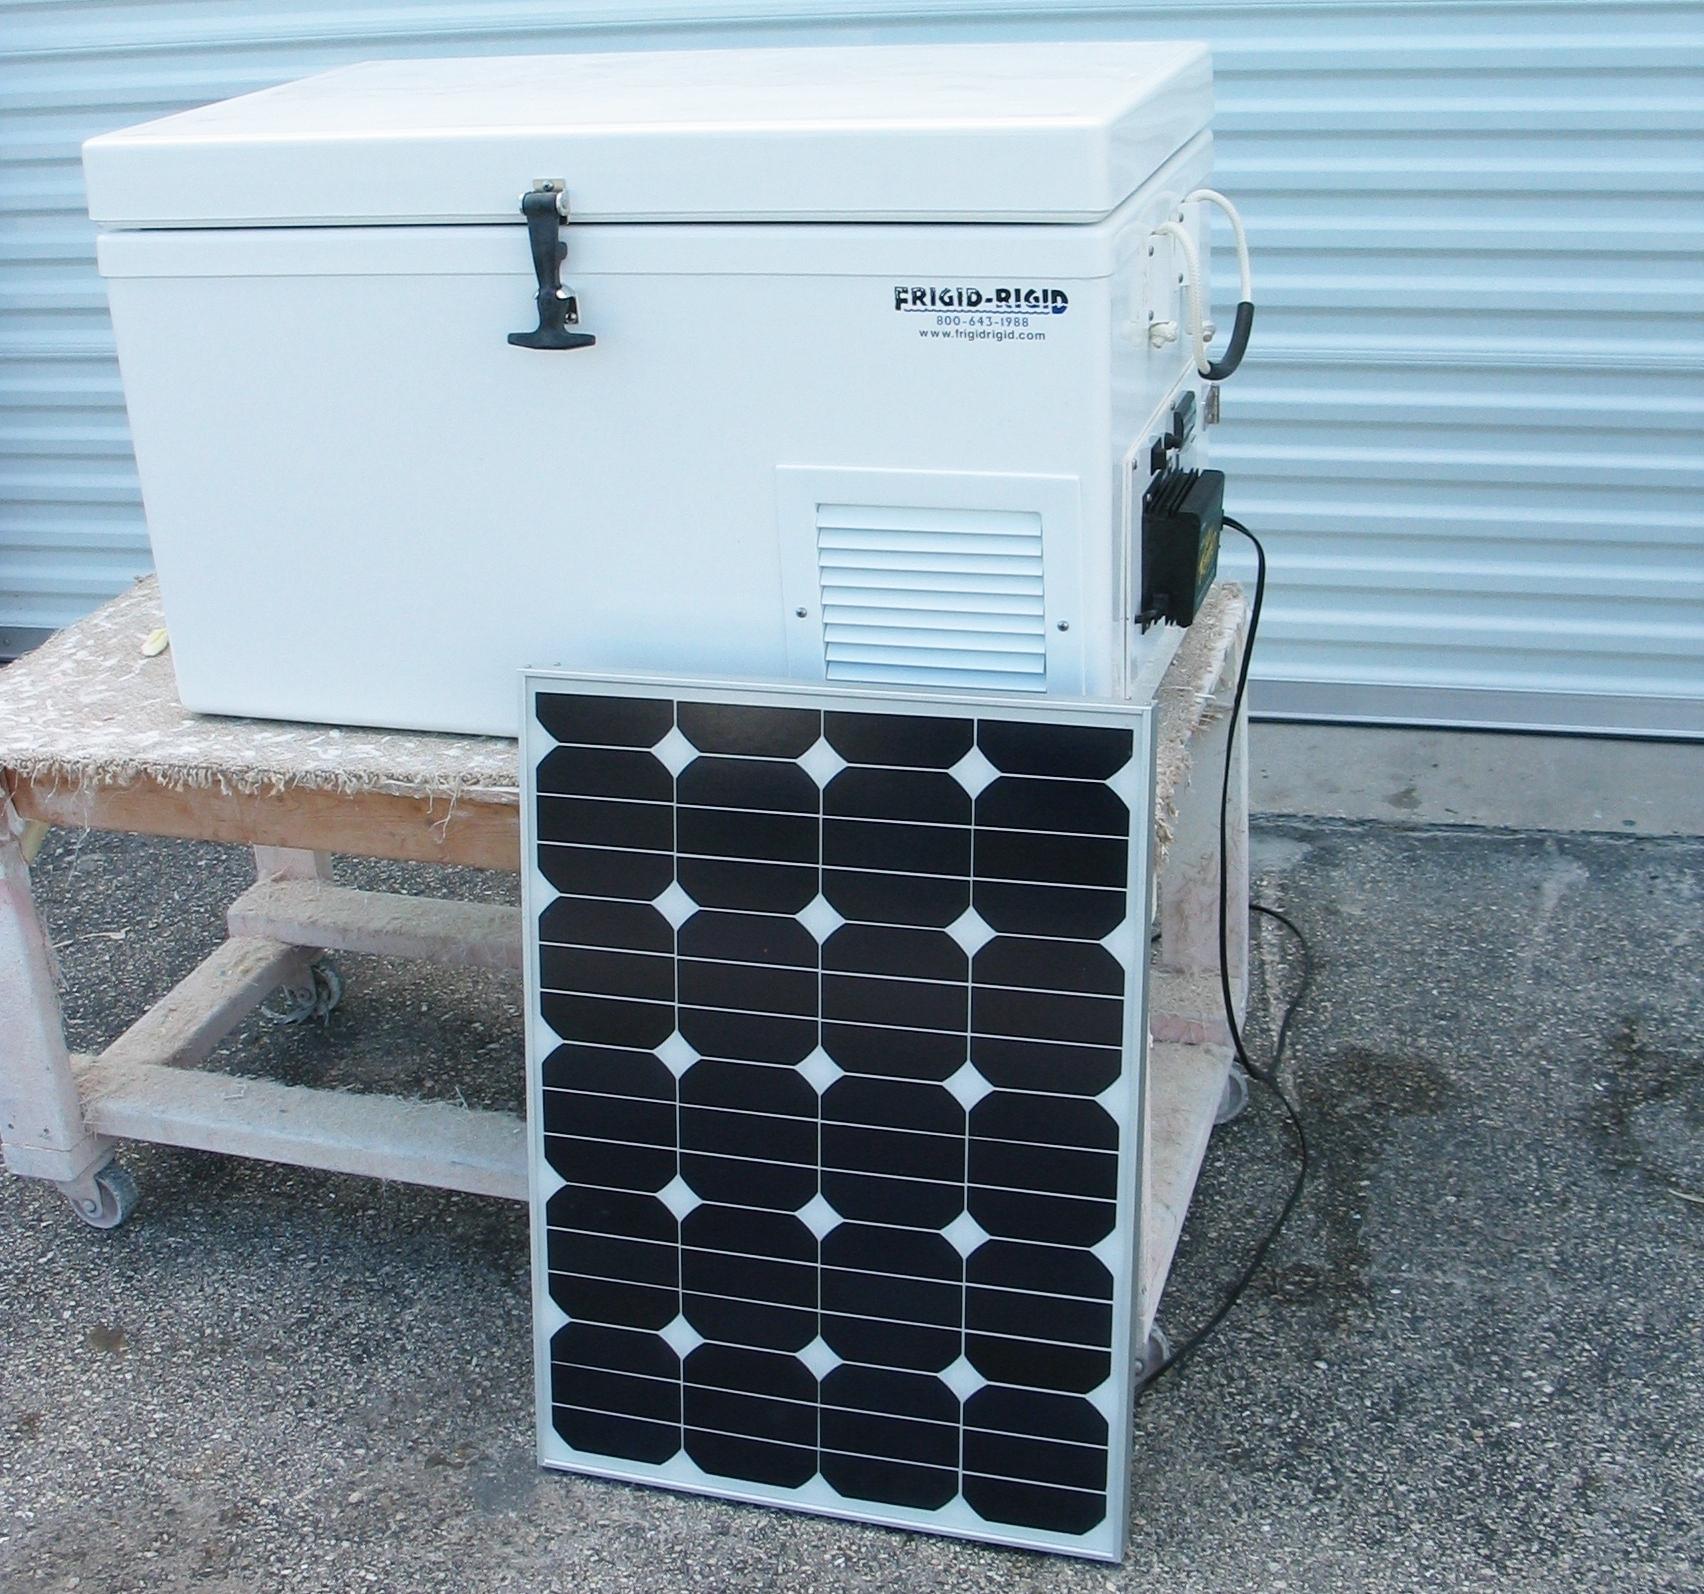 Solar Power Cooler Solar Refrigerator Freezer Frigid Rigid